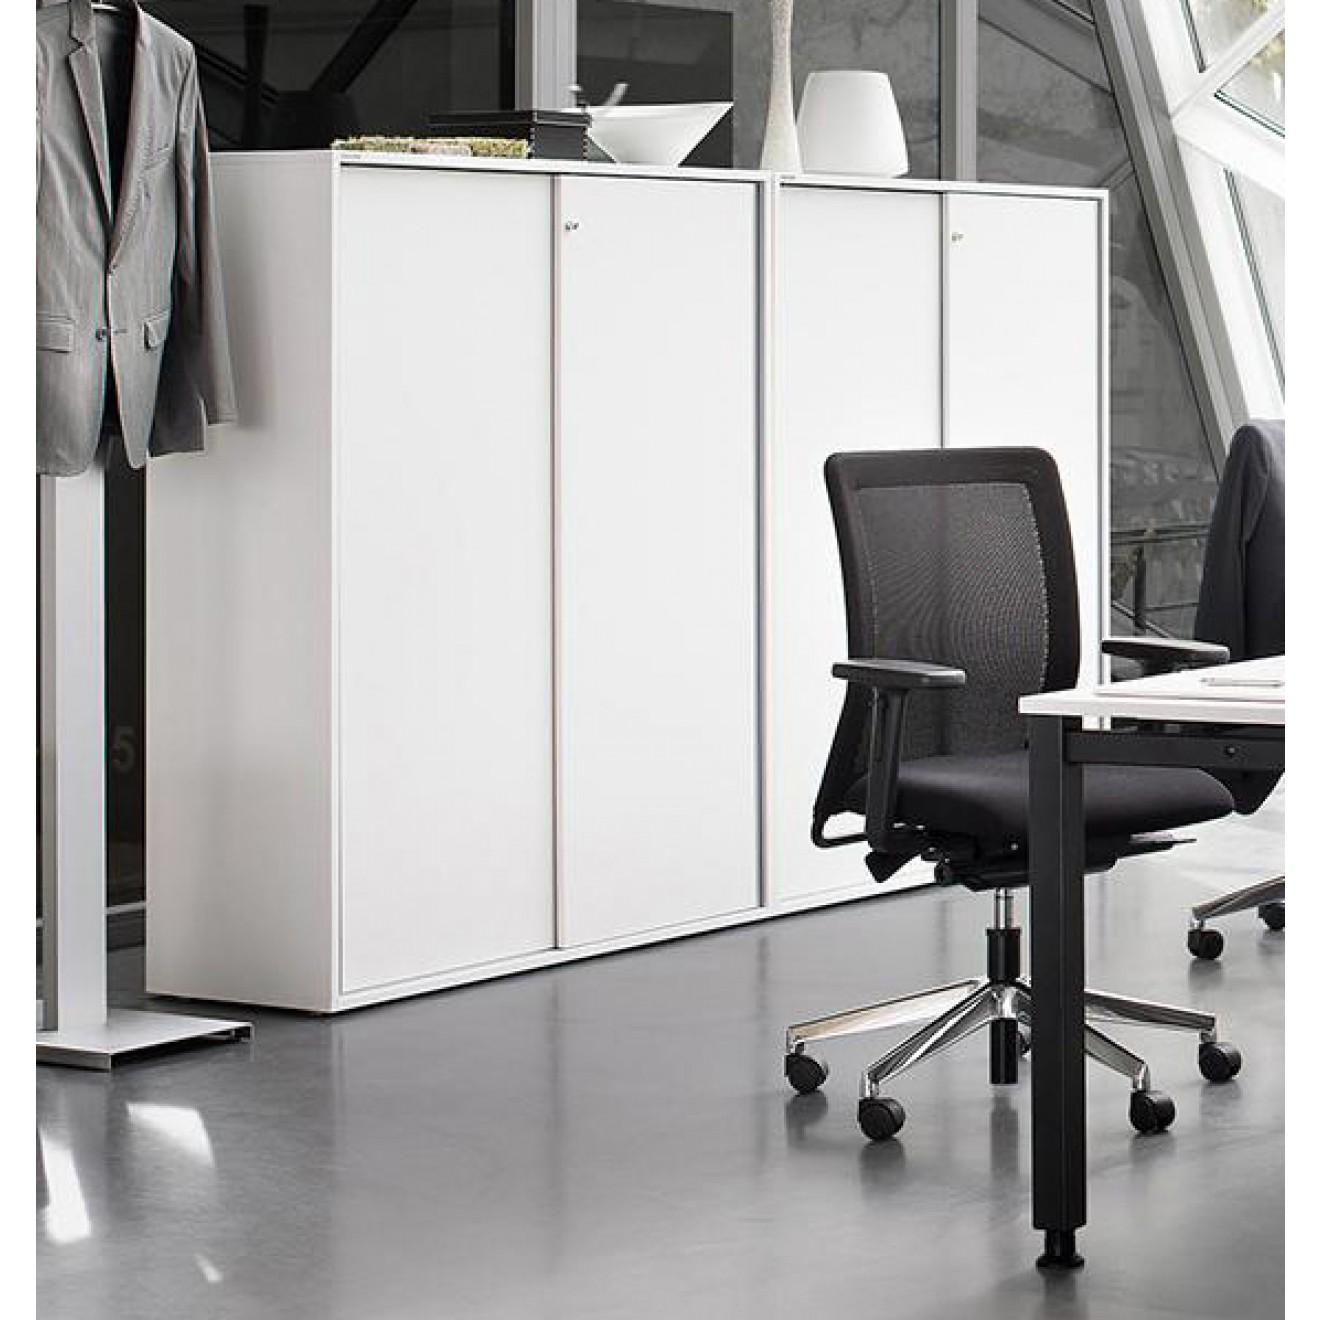 wiesner hager schiebet rschrank float fx 160 cm. Black Bedroom Furniture Sets. Home Design Ideas